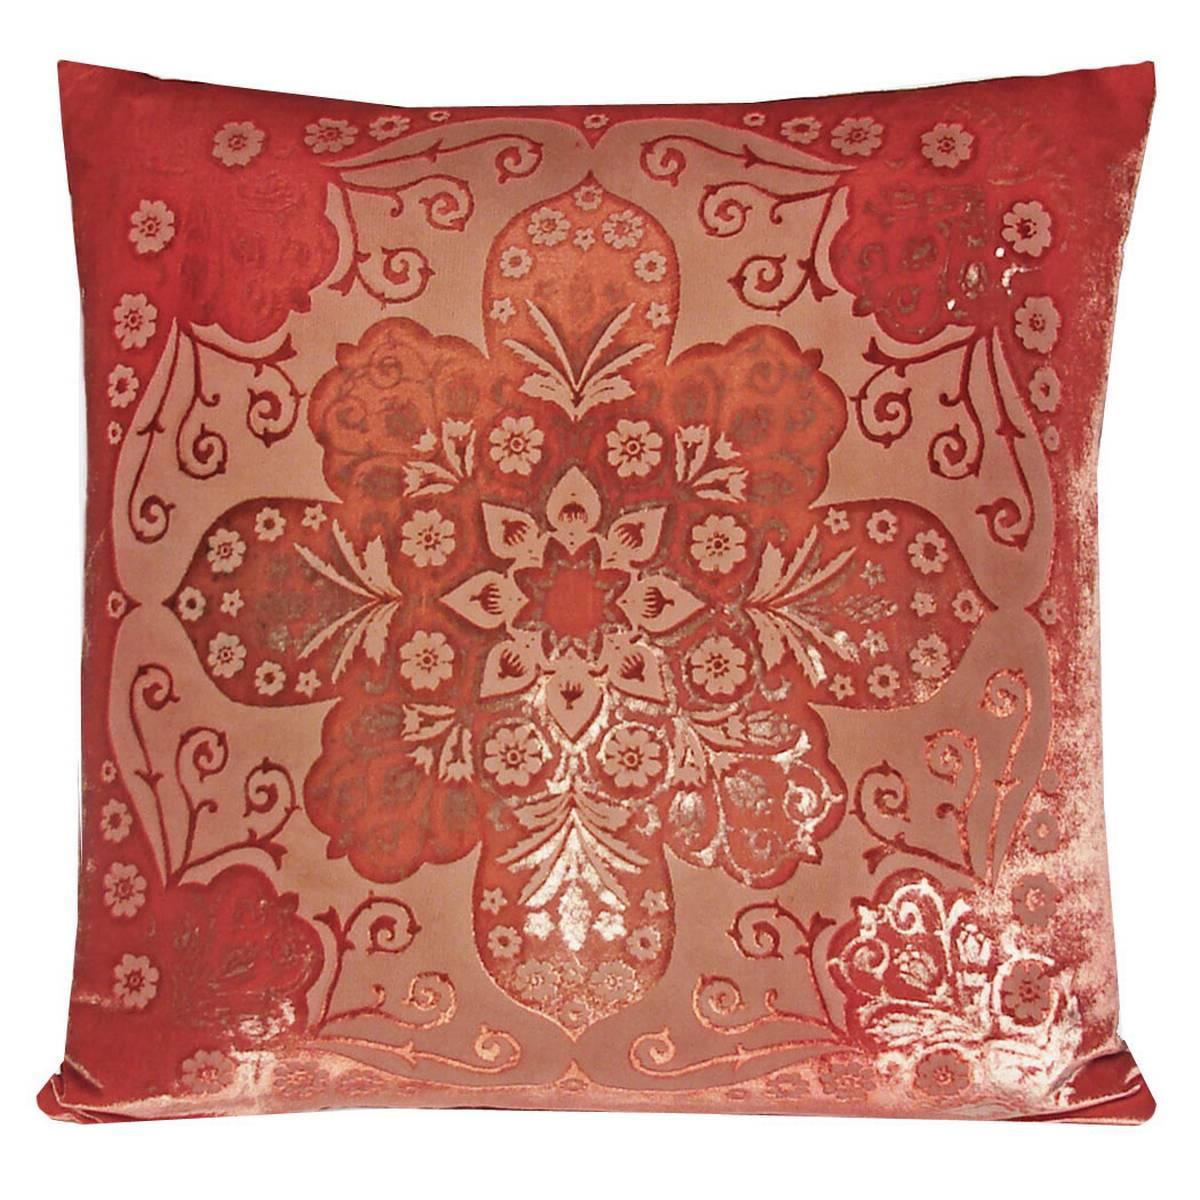 UUU Kevin OBrien Studio Moroccan Velvet Dec Pillow